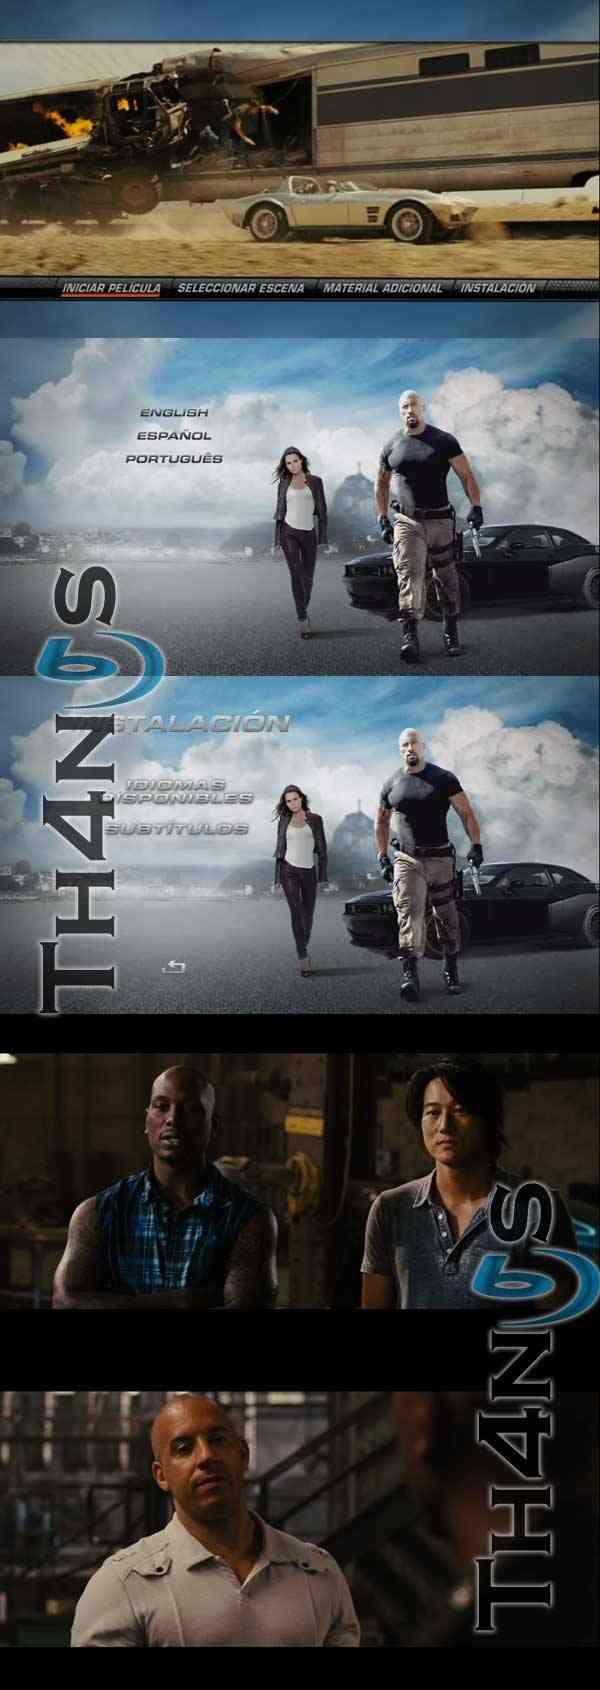 meet the parents full movie greek subtitles download